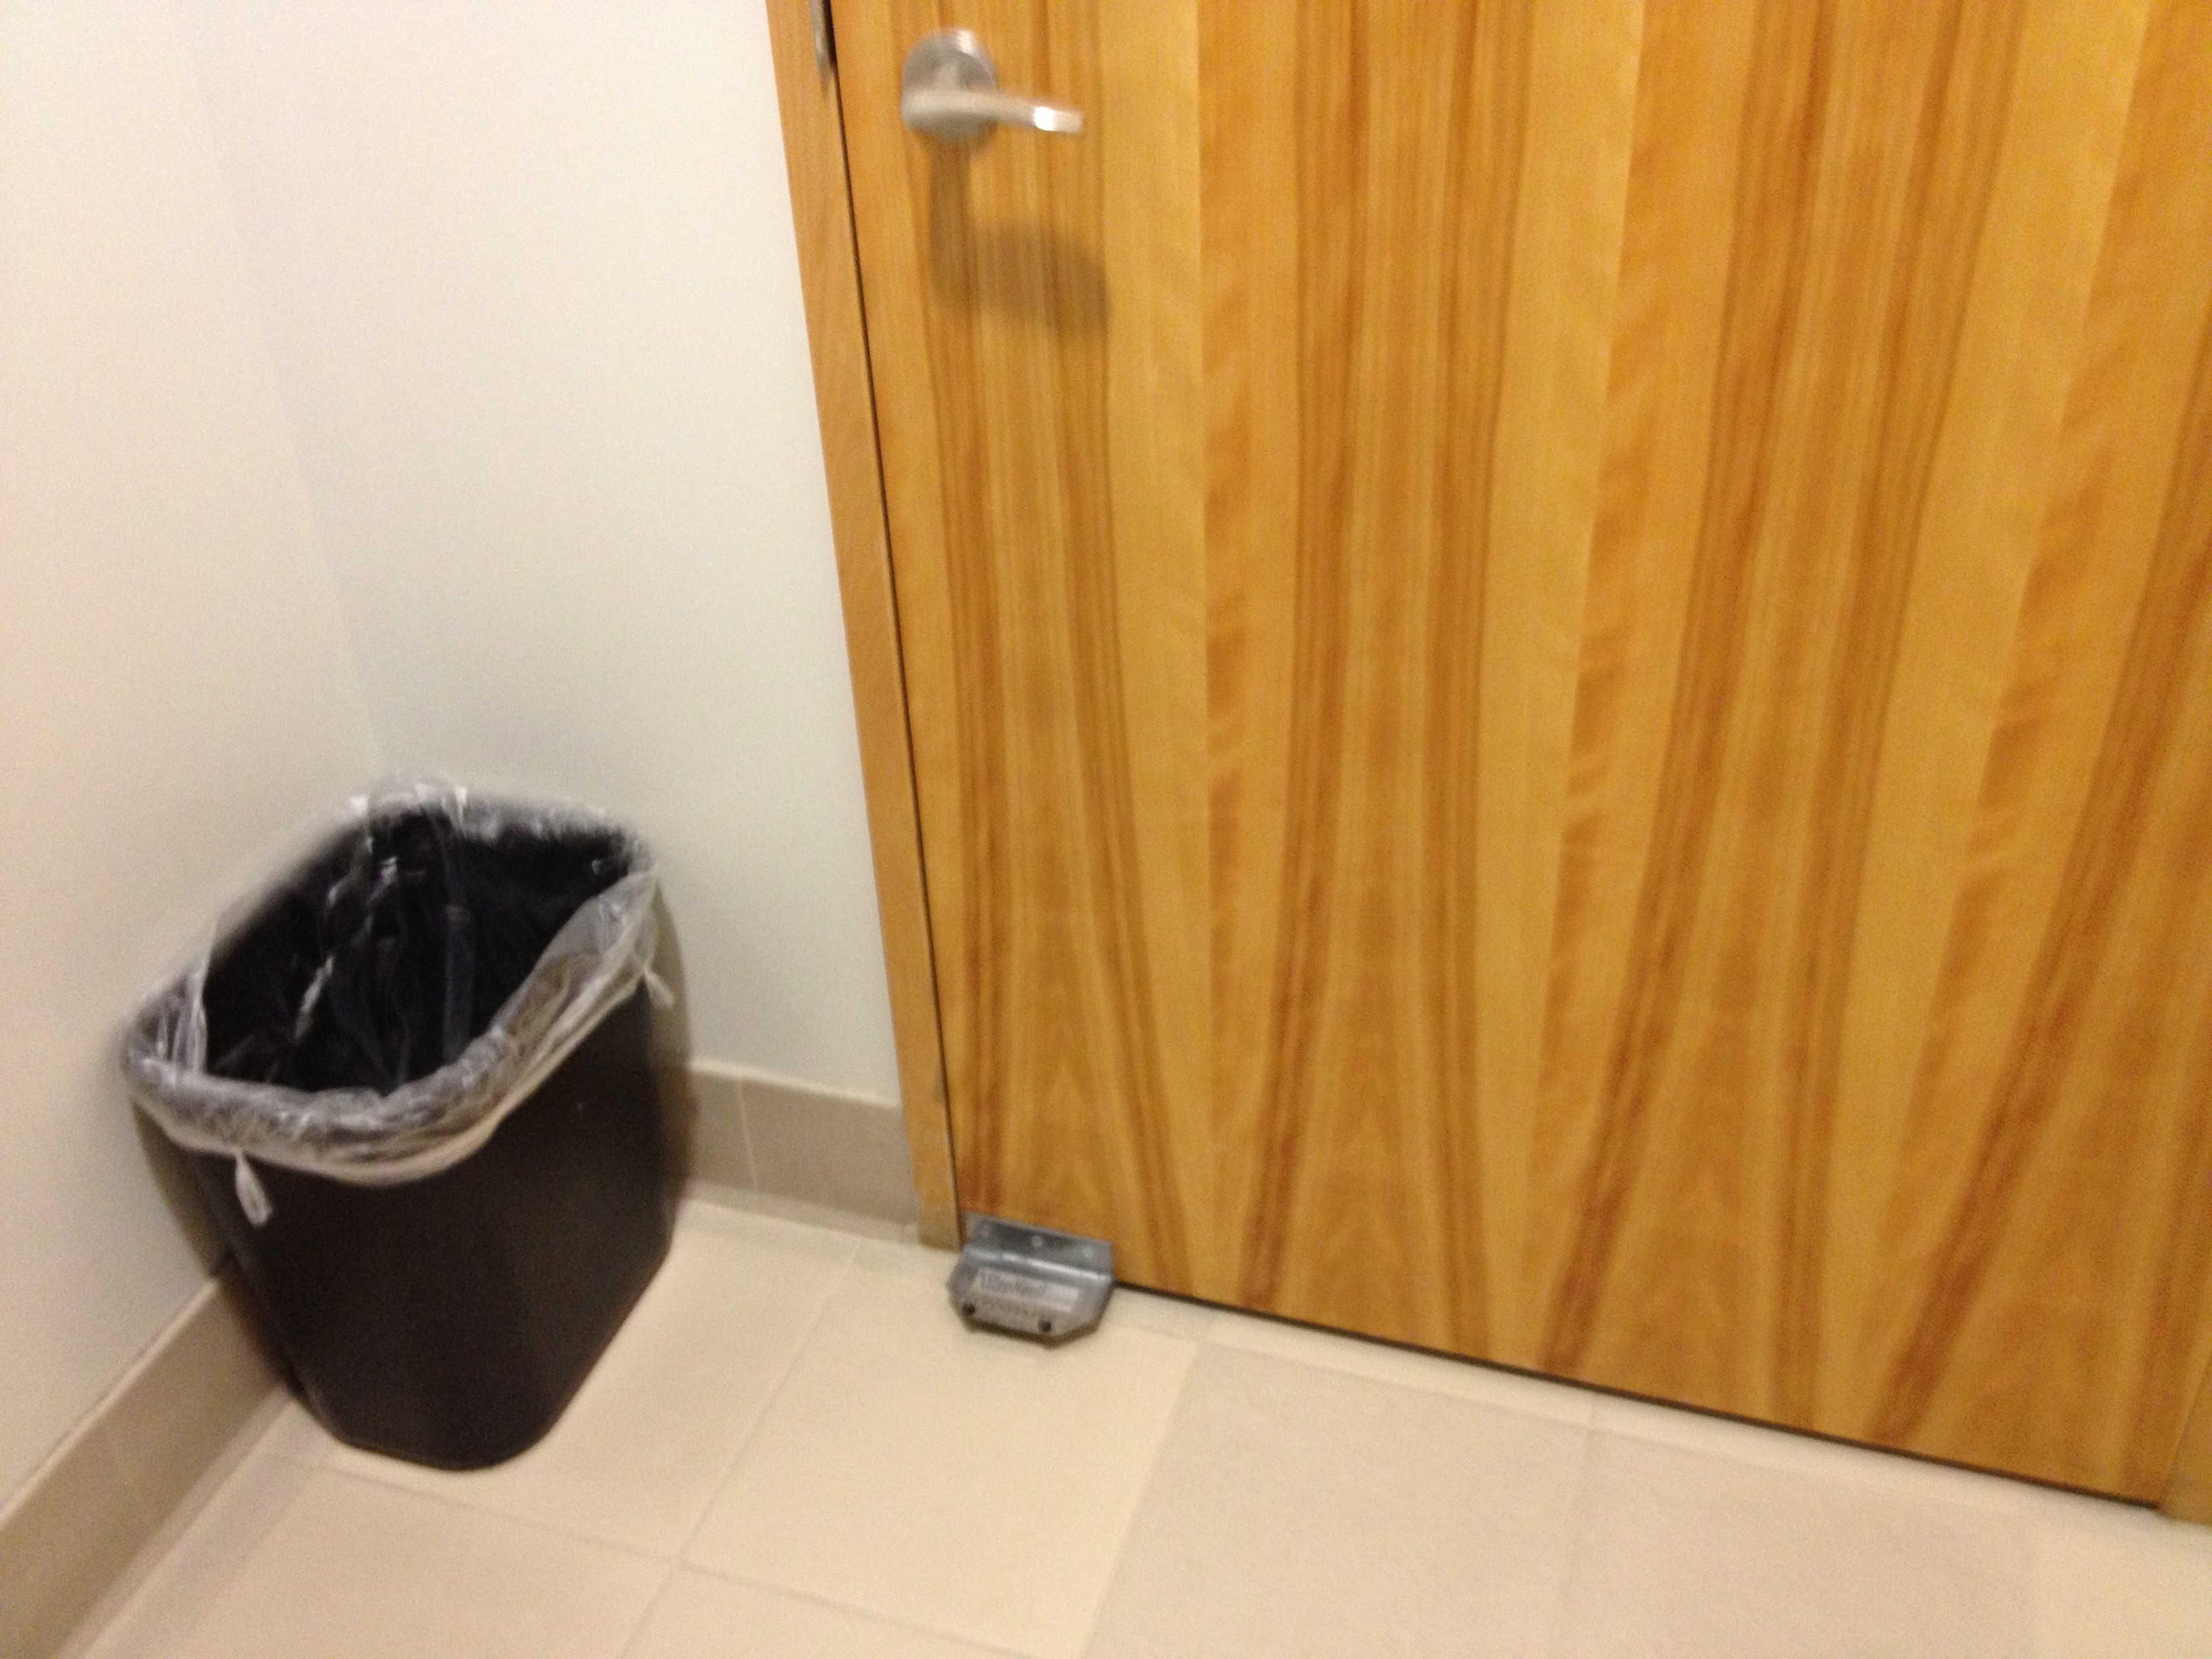 low profile interior door knob photo - 17